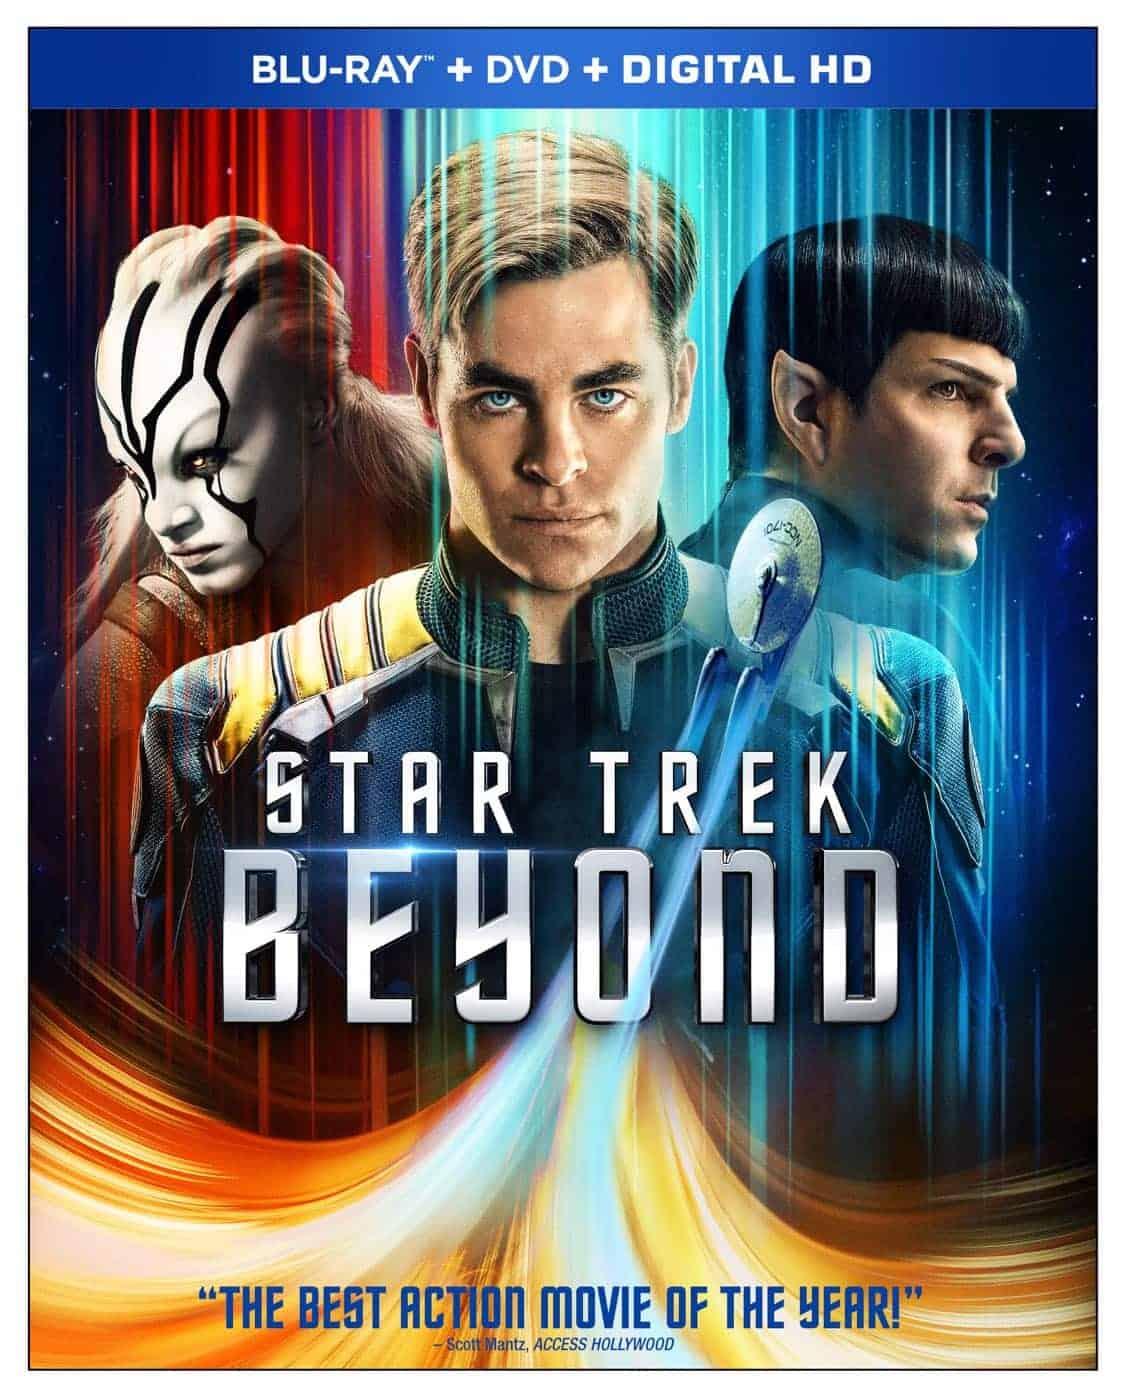 star-trek-beyond-blu-ray-and-dvd-release-details